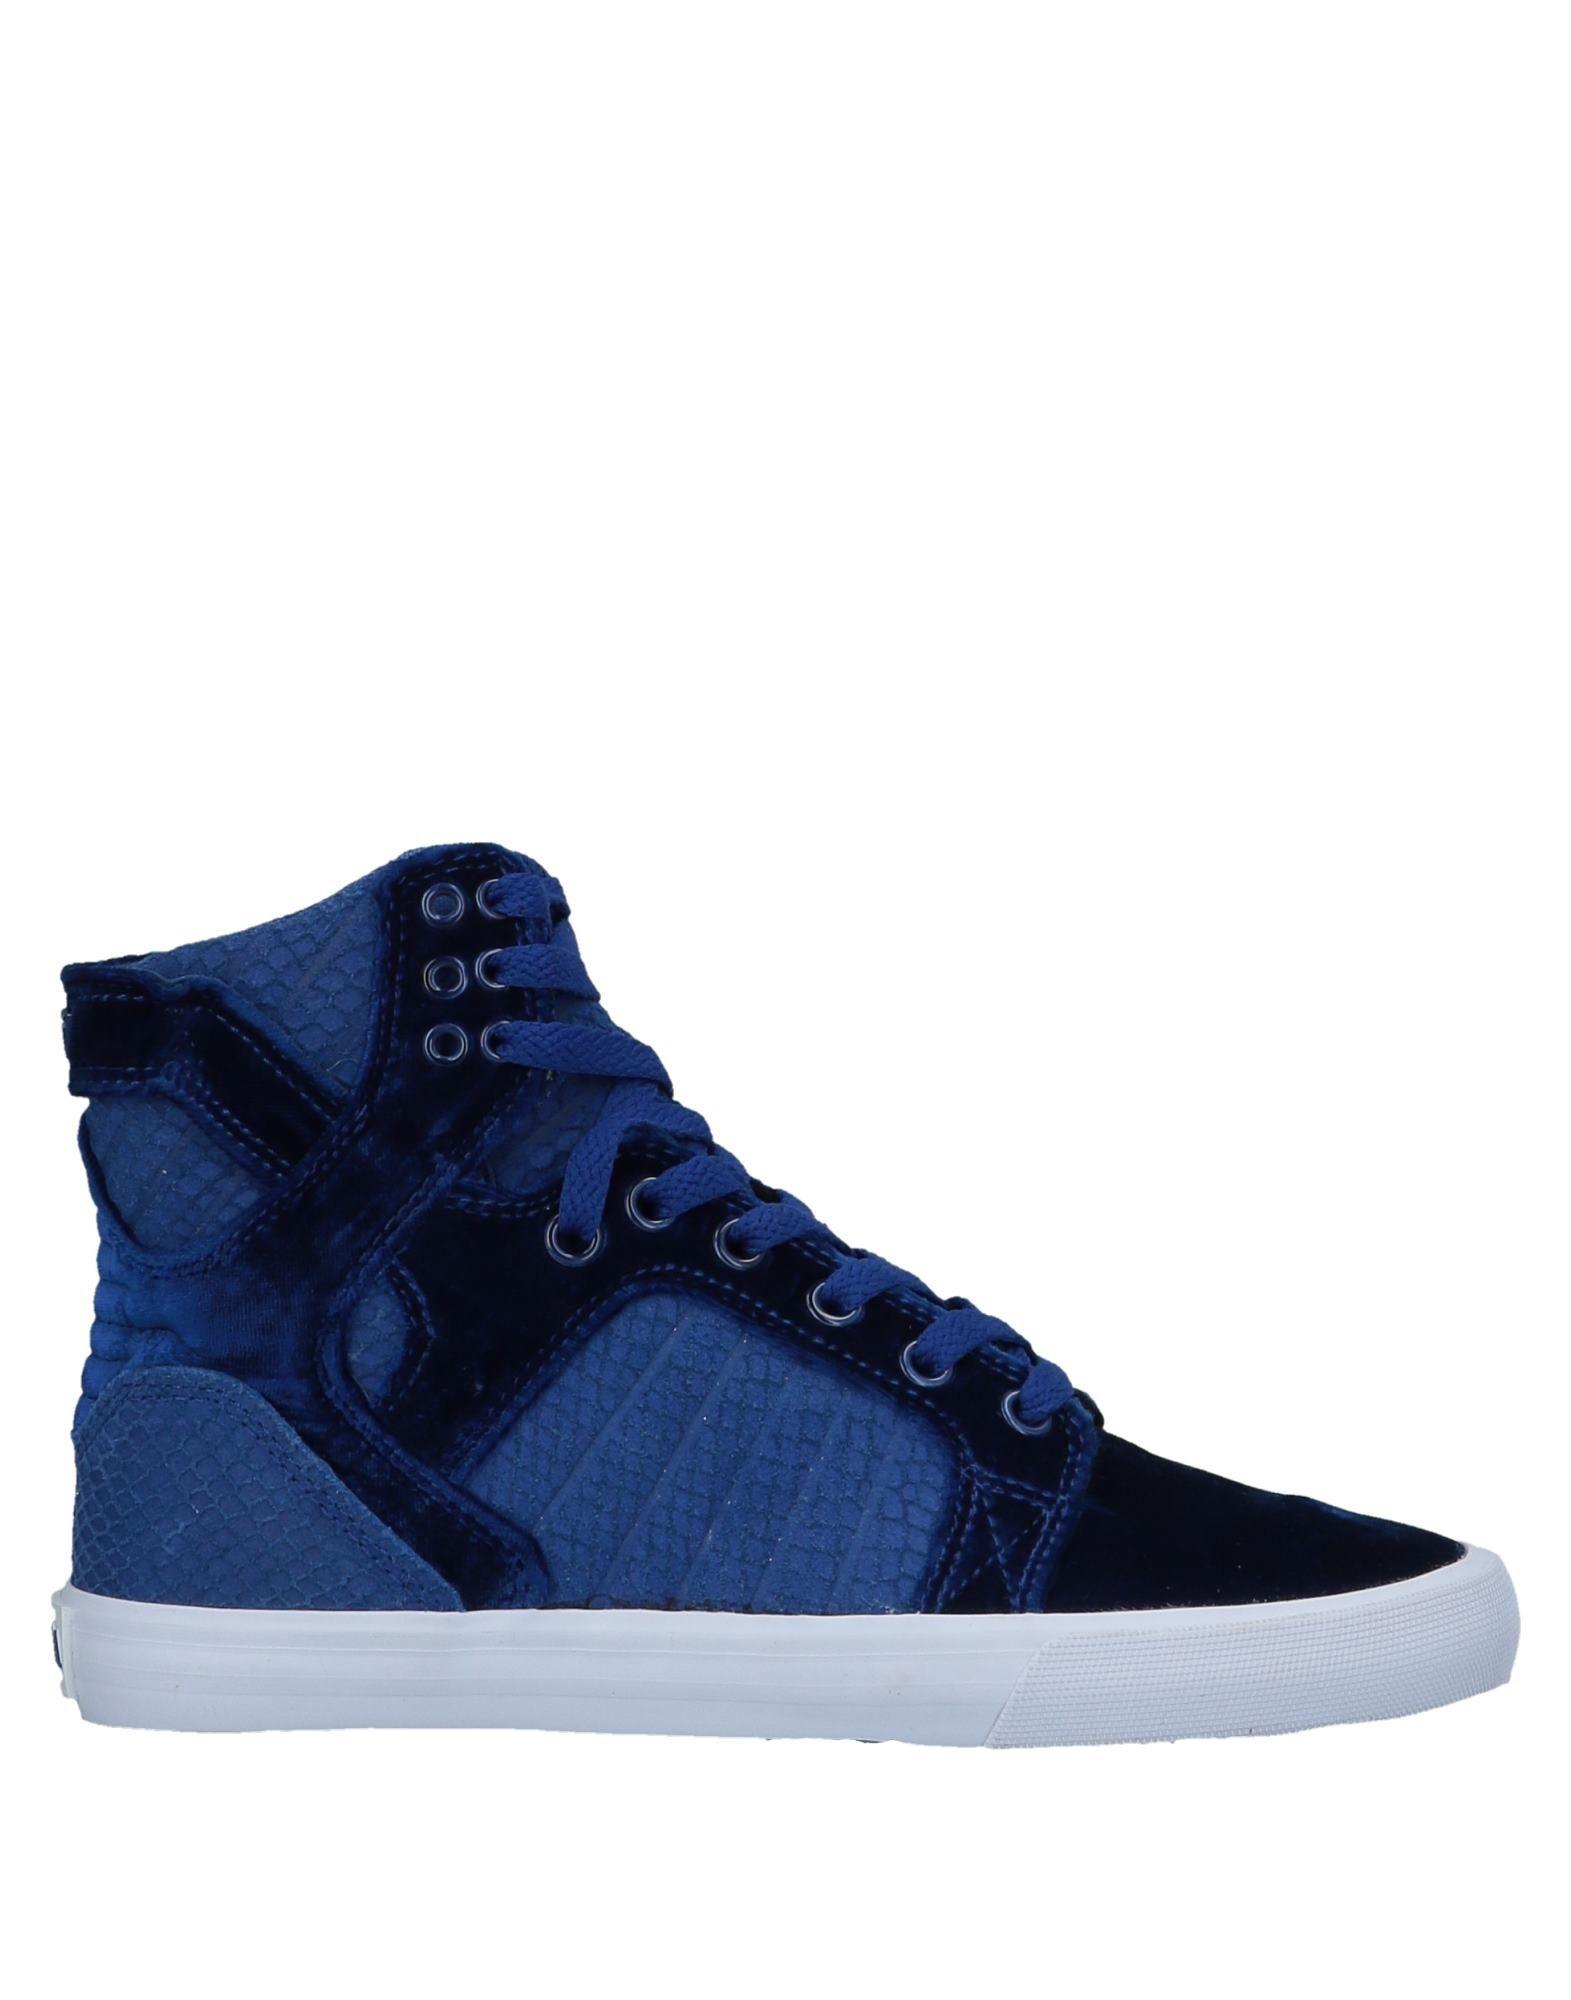 Supra Sneakers Damen  beliebte 11509288SH Gute Qualität beliebte  Schuhe 201127